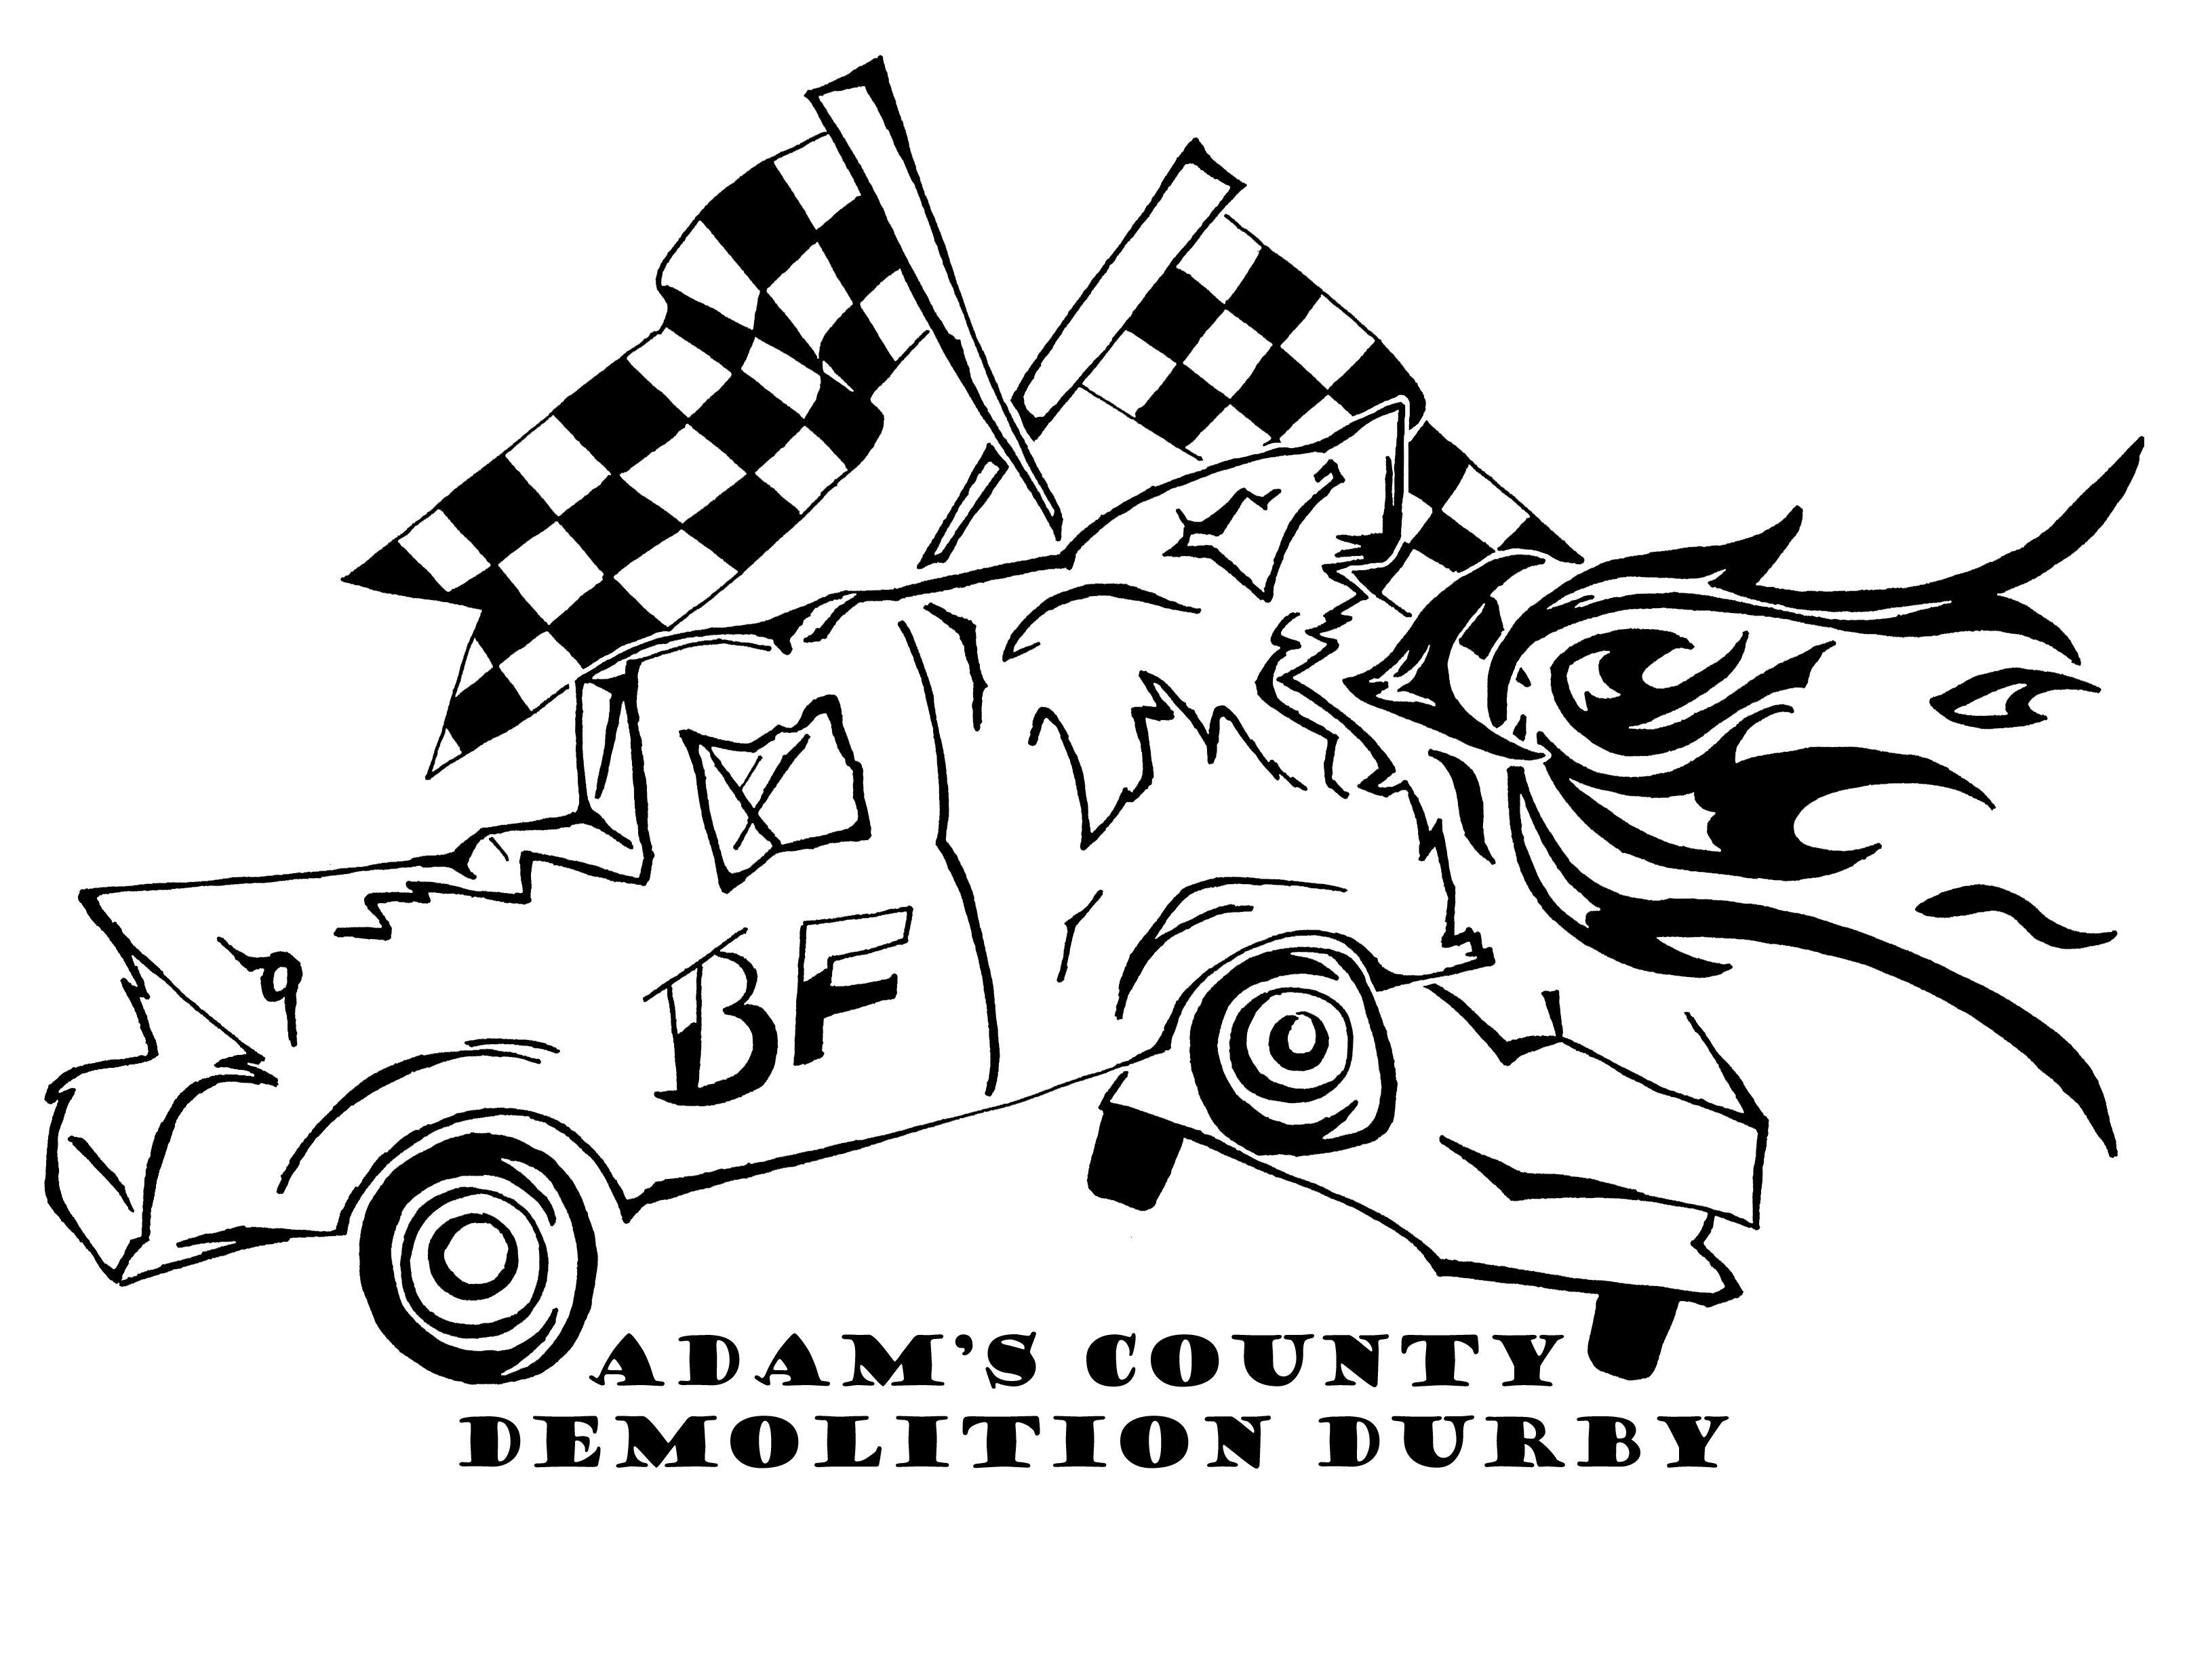 Demolition Derby Car Coloring Pages Agouraalumni Sketch Coloring Page Demolition Derby Cars Demolition Derby Derby Cars [ 2478 x 3228 Pixel ]